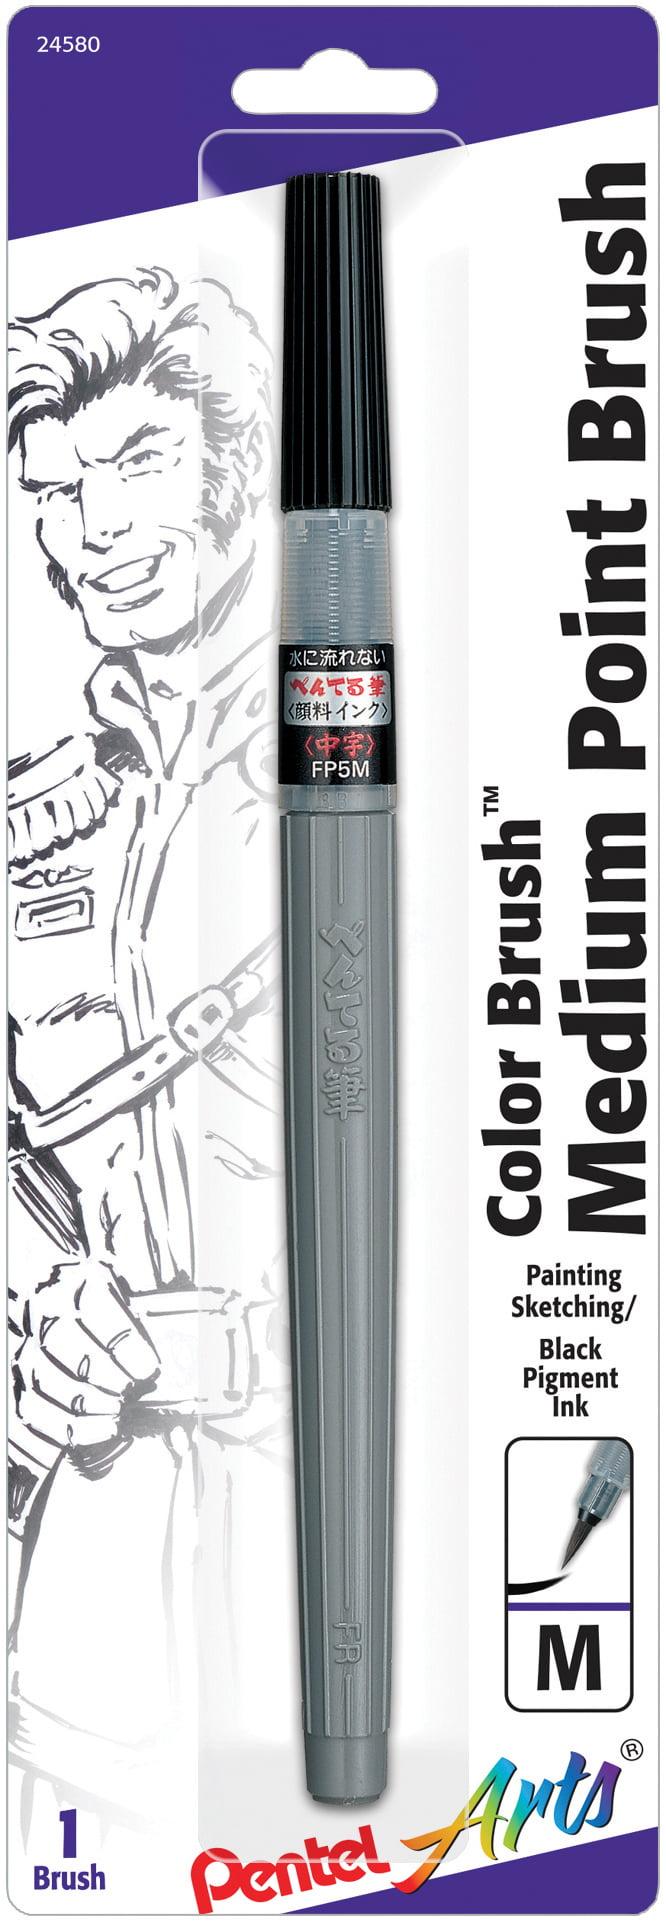 Pentel Black Permanent Brush Marker Pen Art Colour Pigment